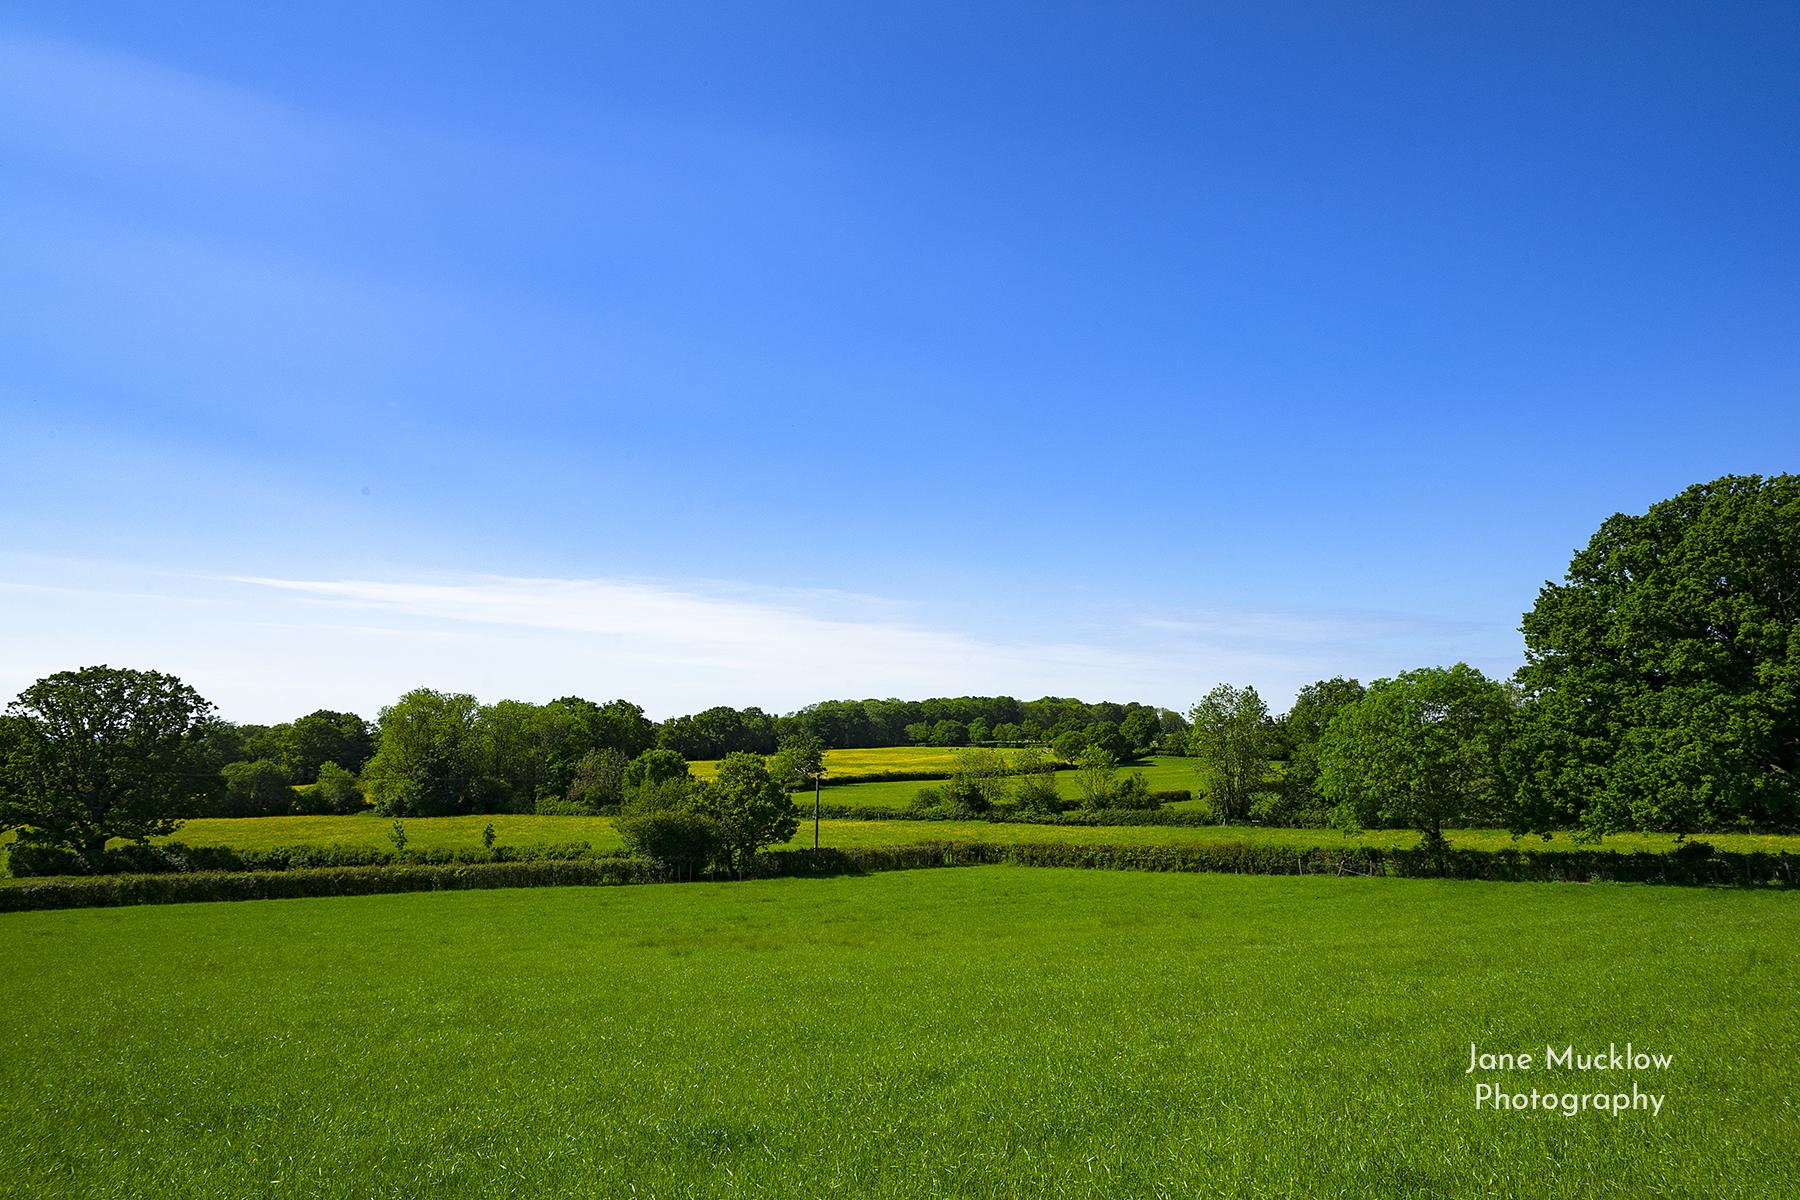 Photo by Jane Mucklow of a dandelion field view towards Sevenoaks, Kent, from near Underriver.